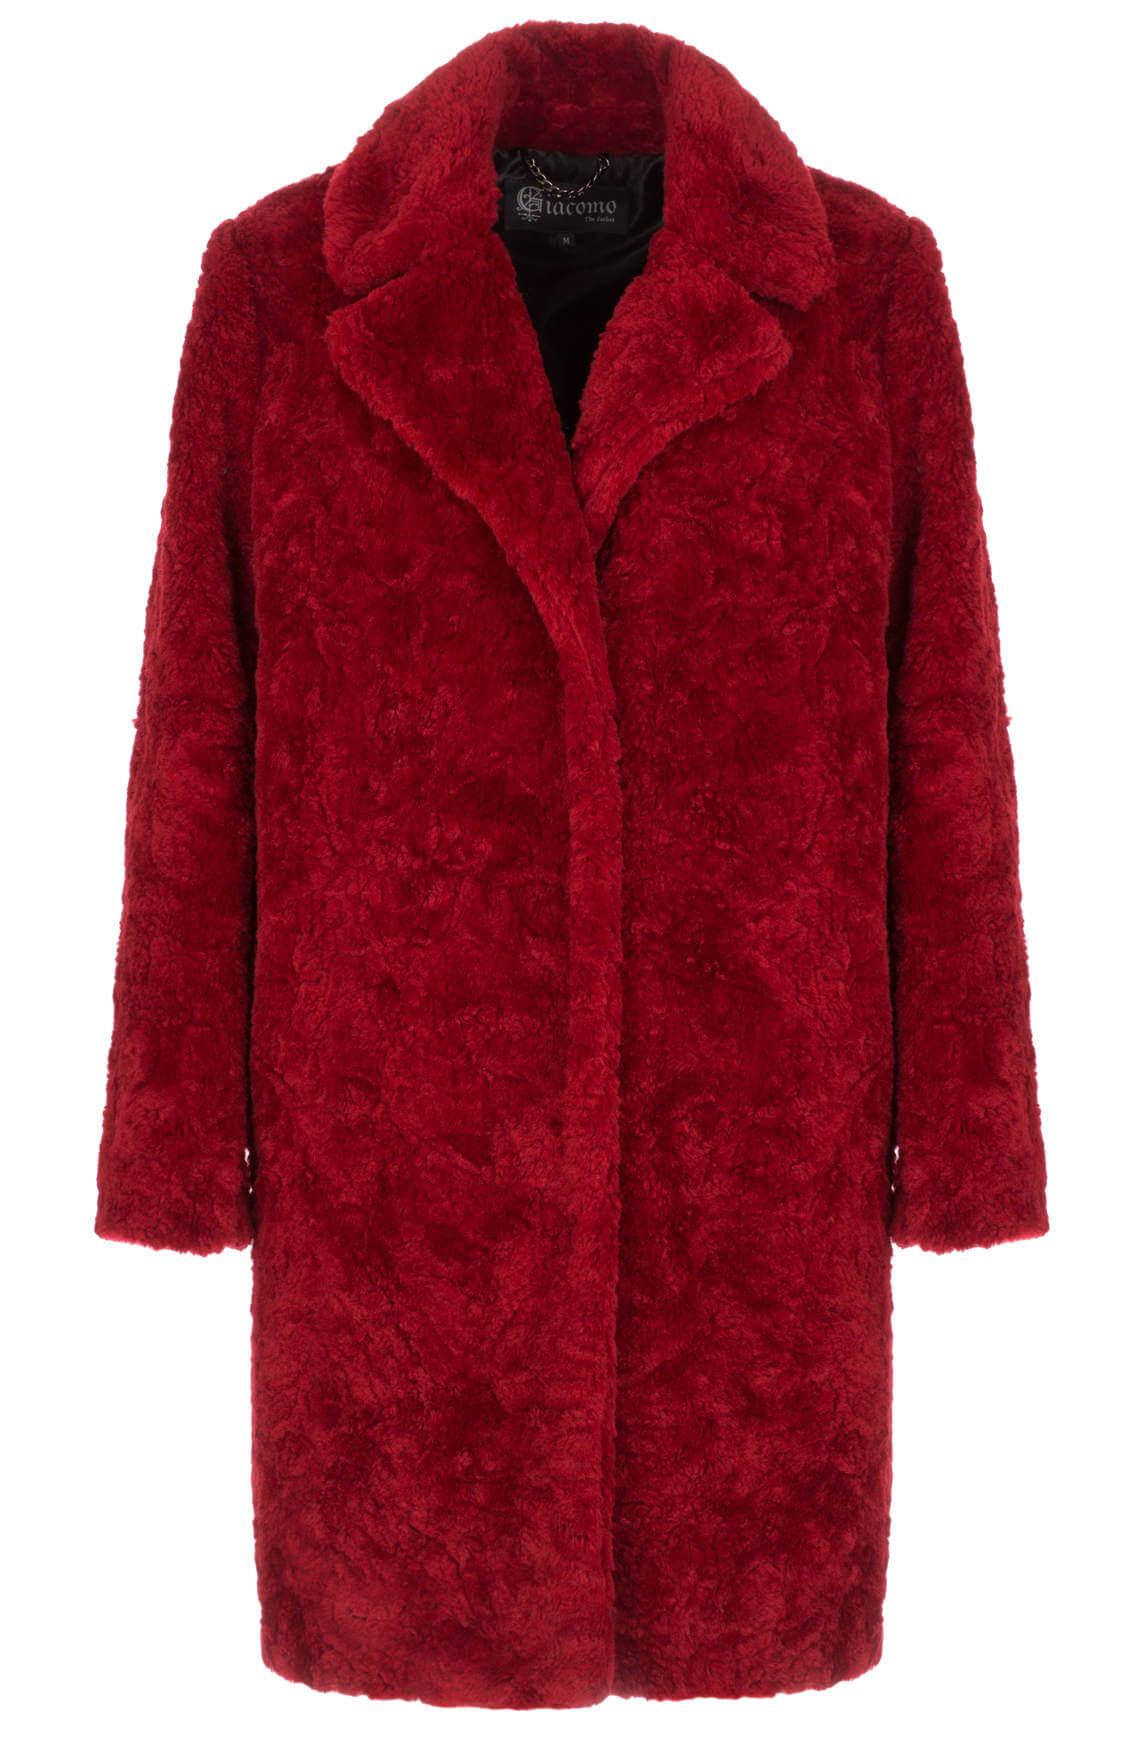 Giacomo Dames Faux fur mantel rood Rood